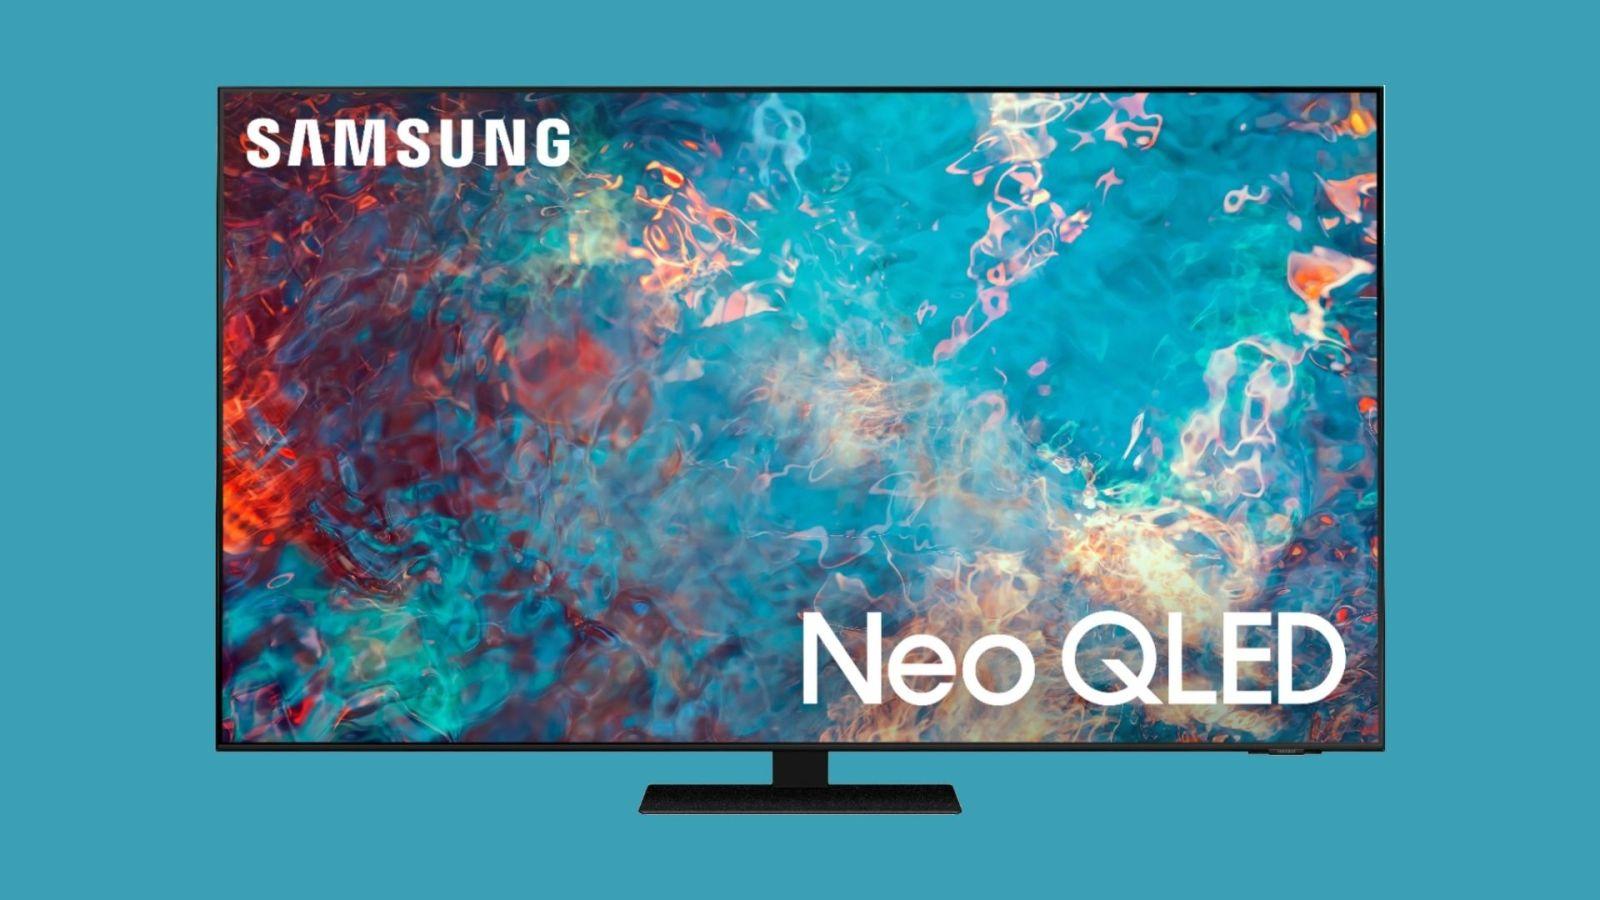 Samsung Neo QLED 4K UHD Smart Tizen TV now $500 off